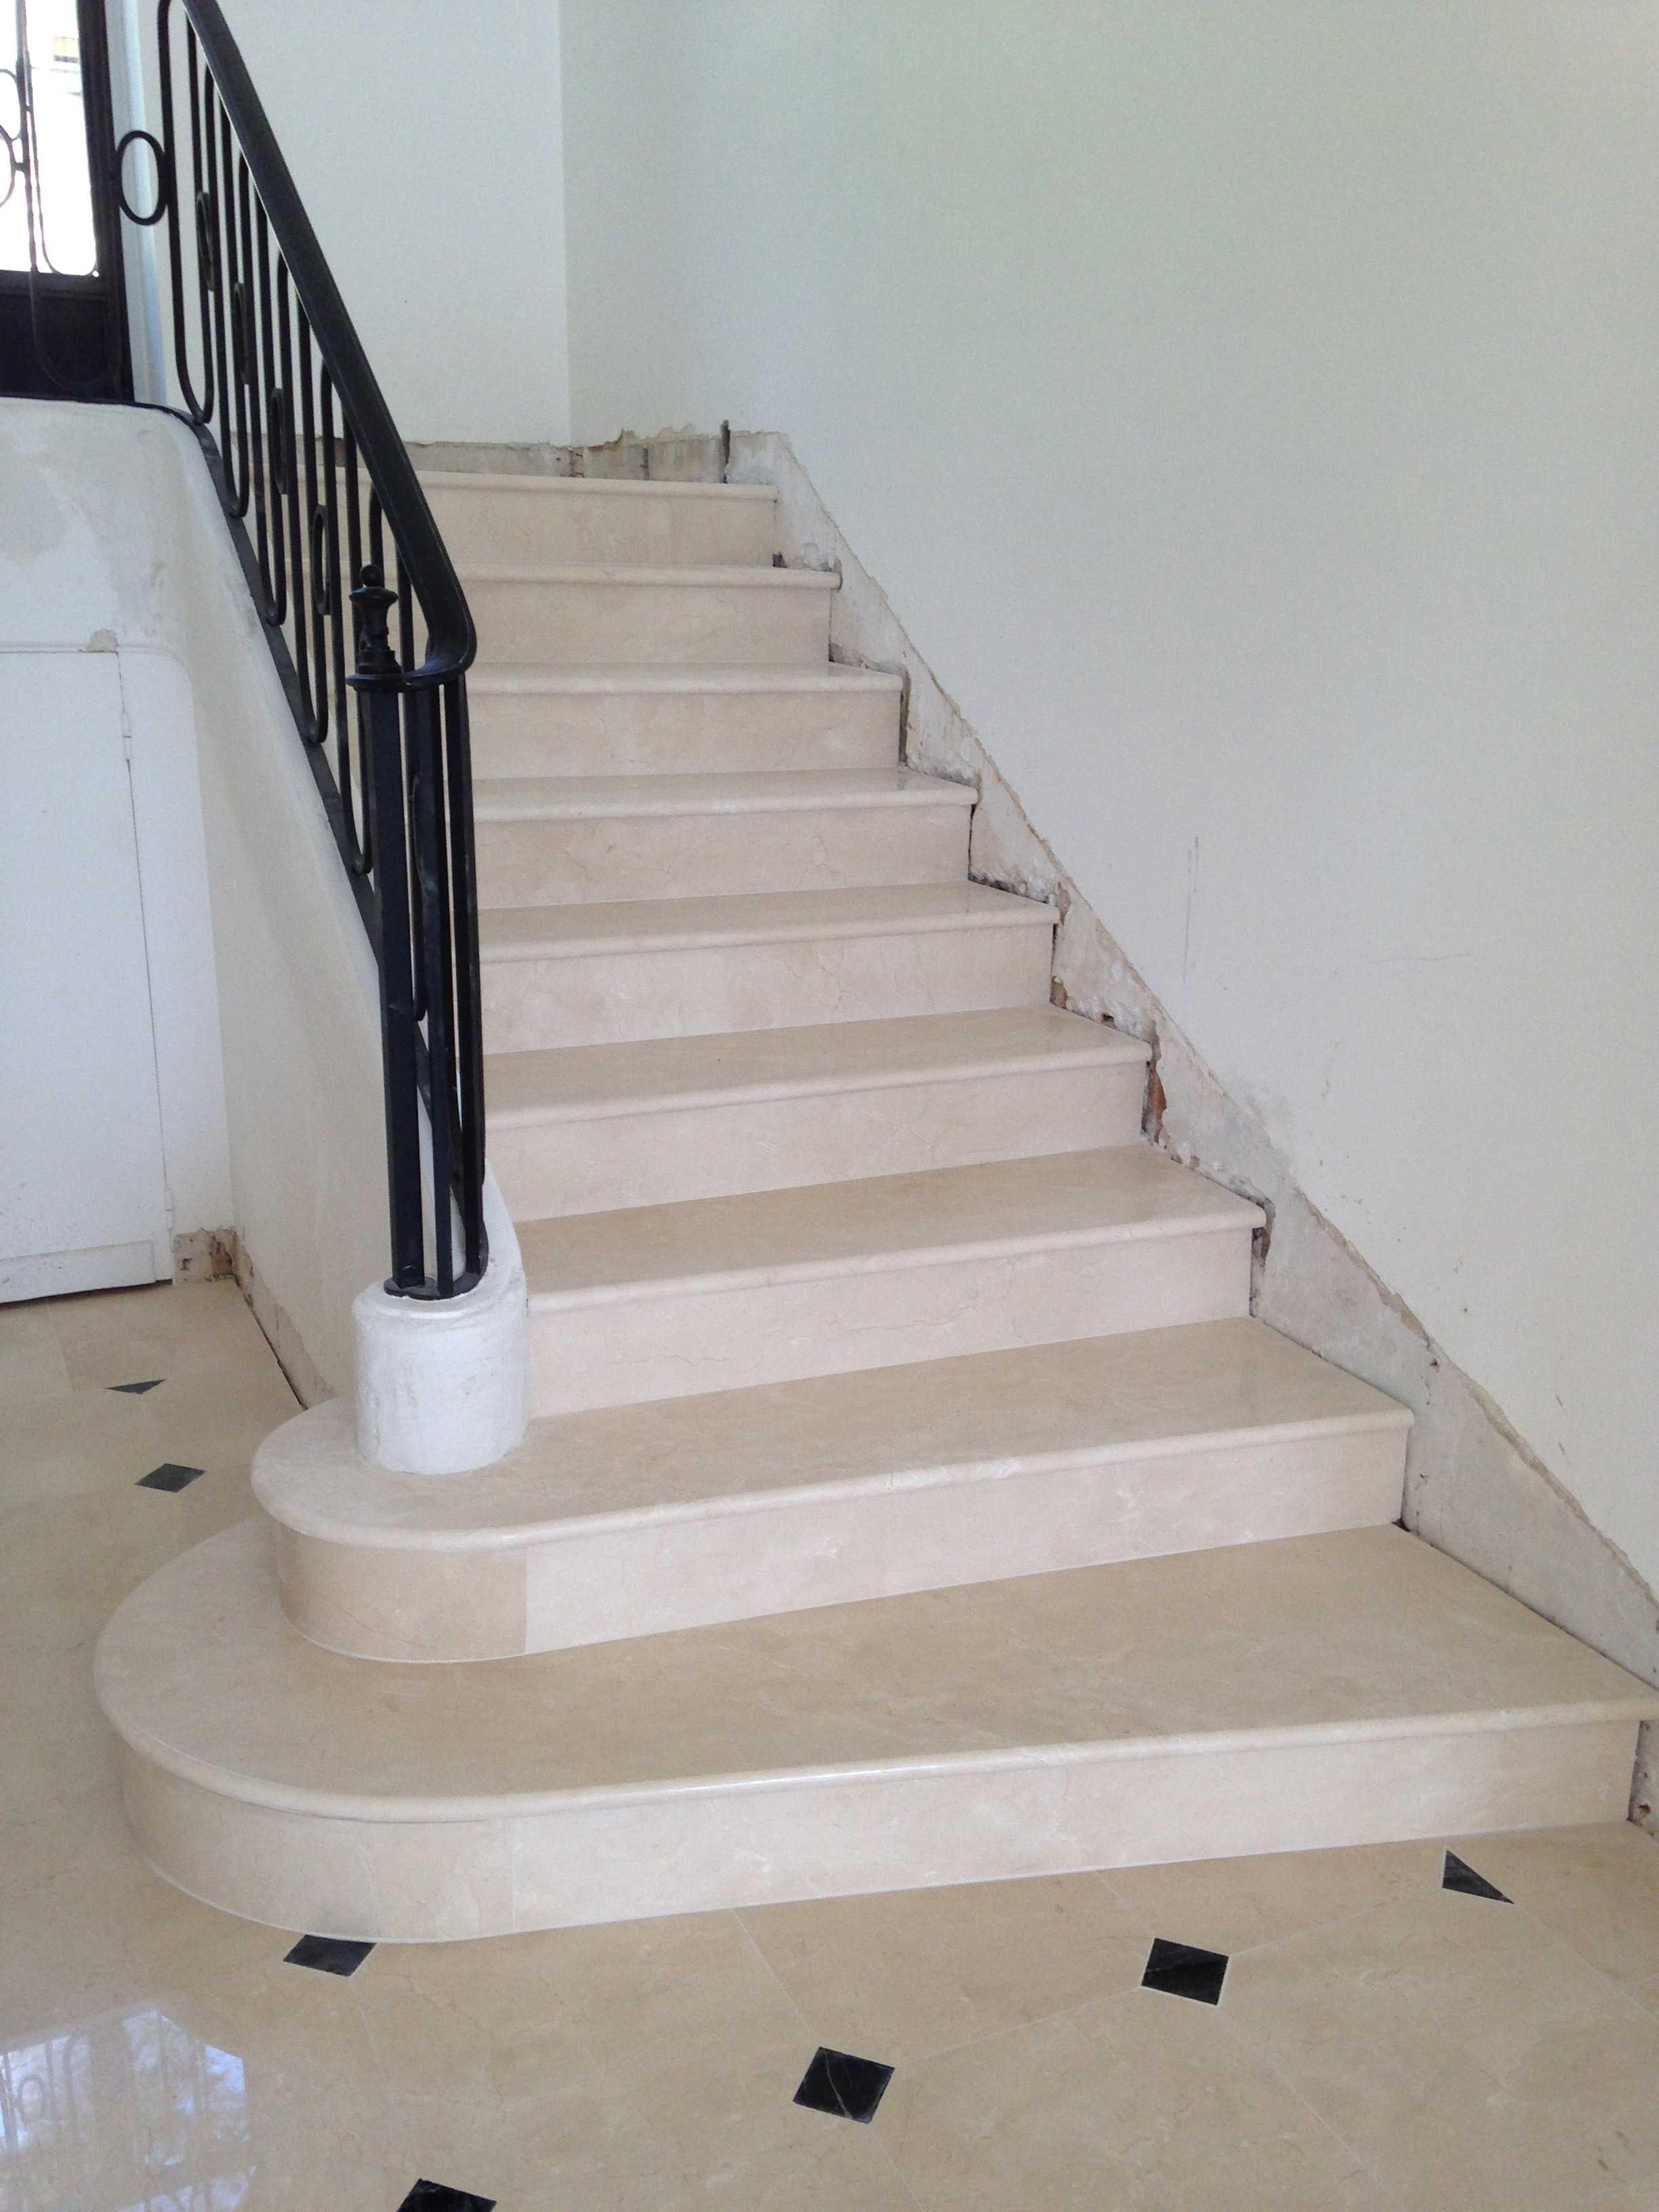 escalier en marbre villa priv e cannes type marfil finition polie brillant. Black Bedroom Furniture Sets. Home Design Ideas